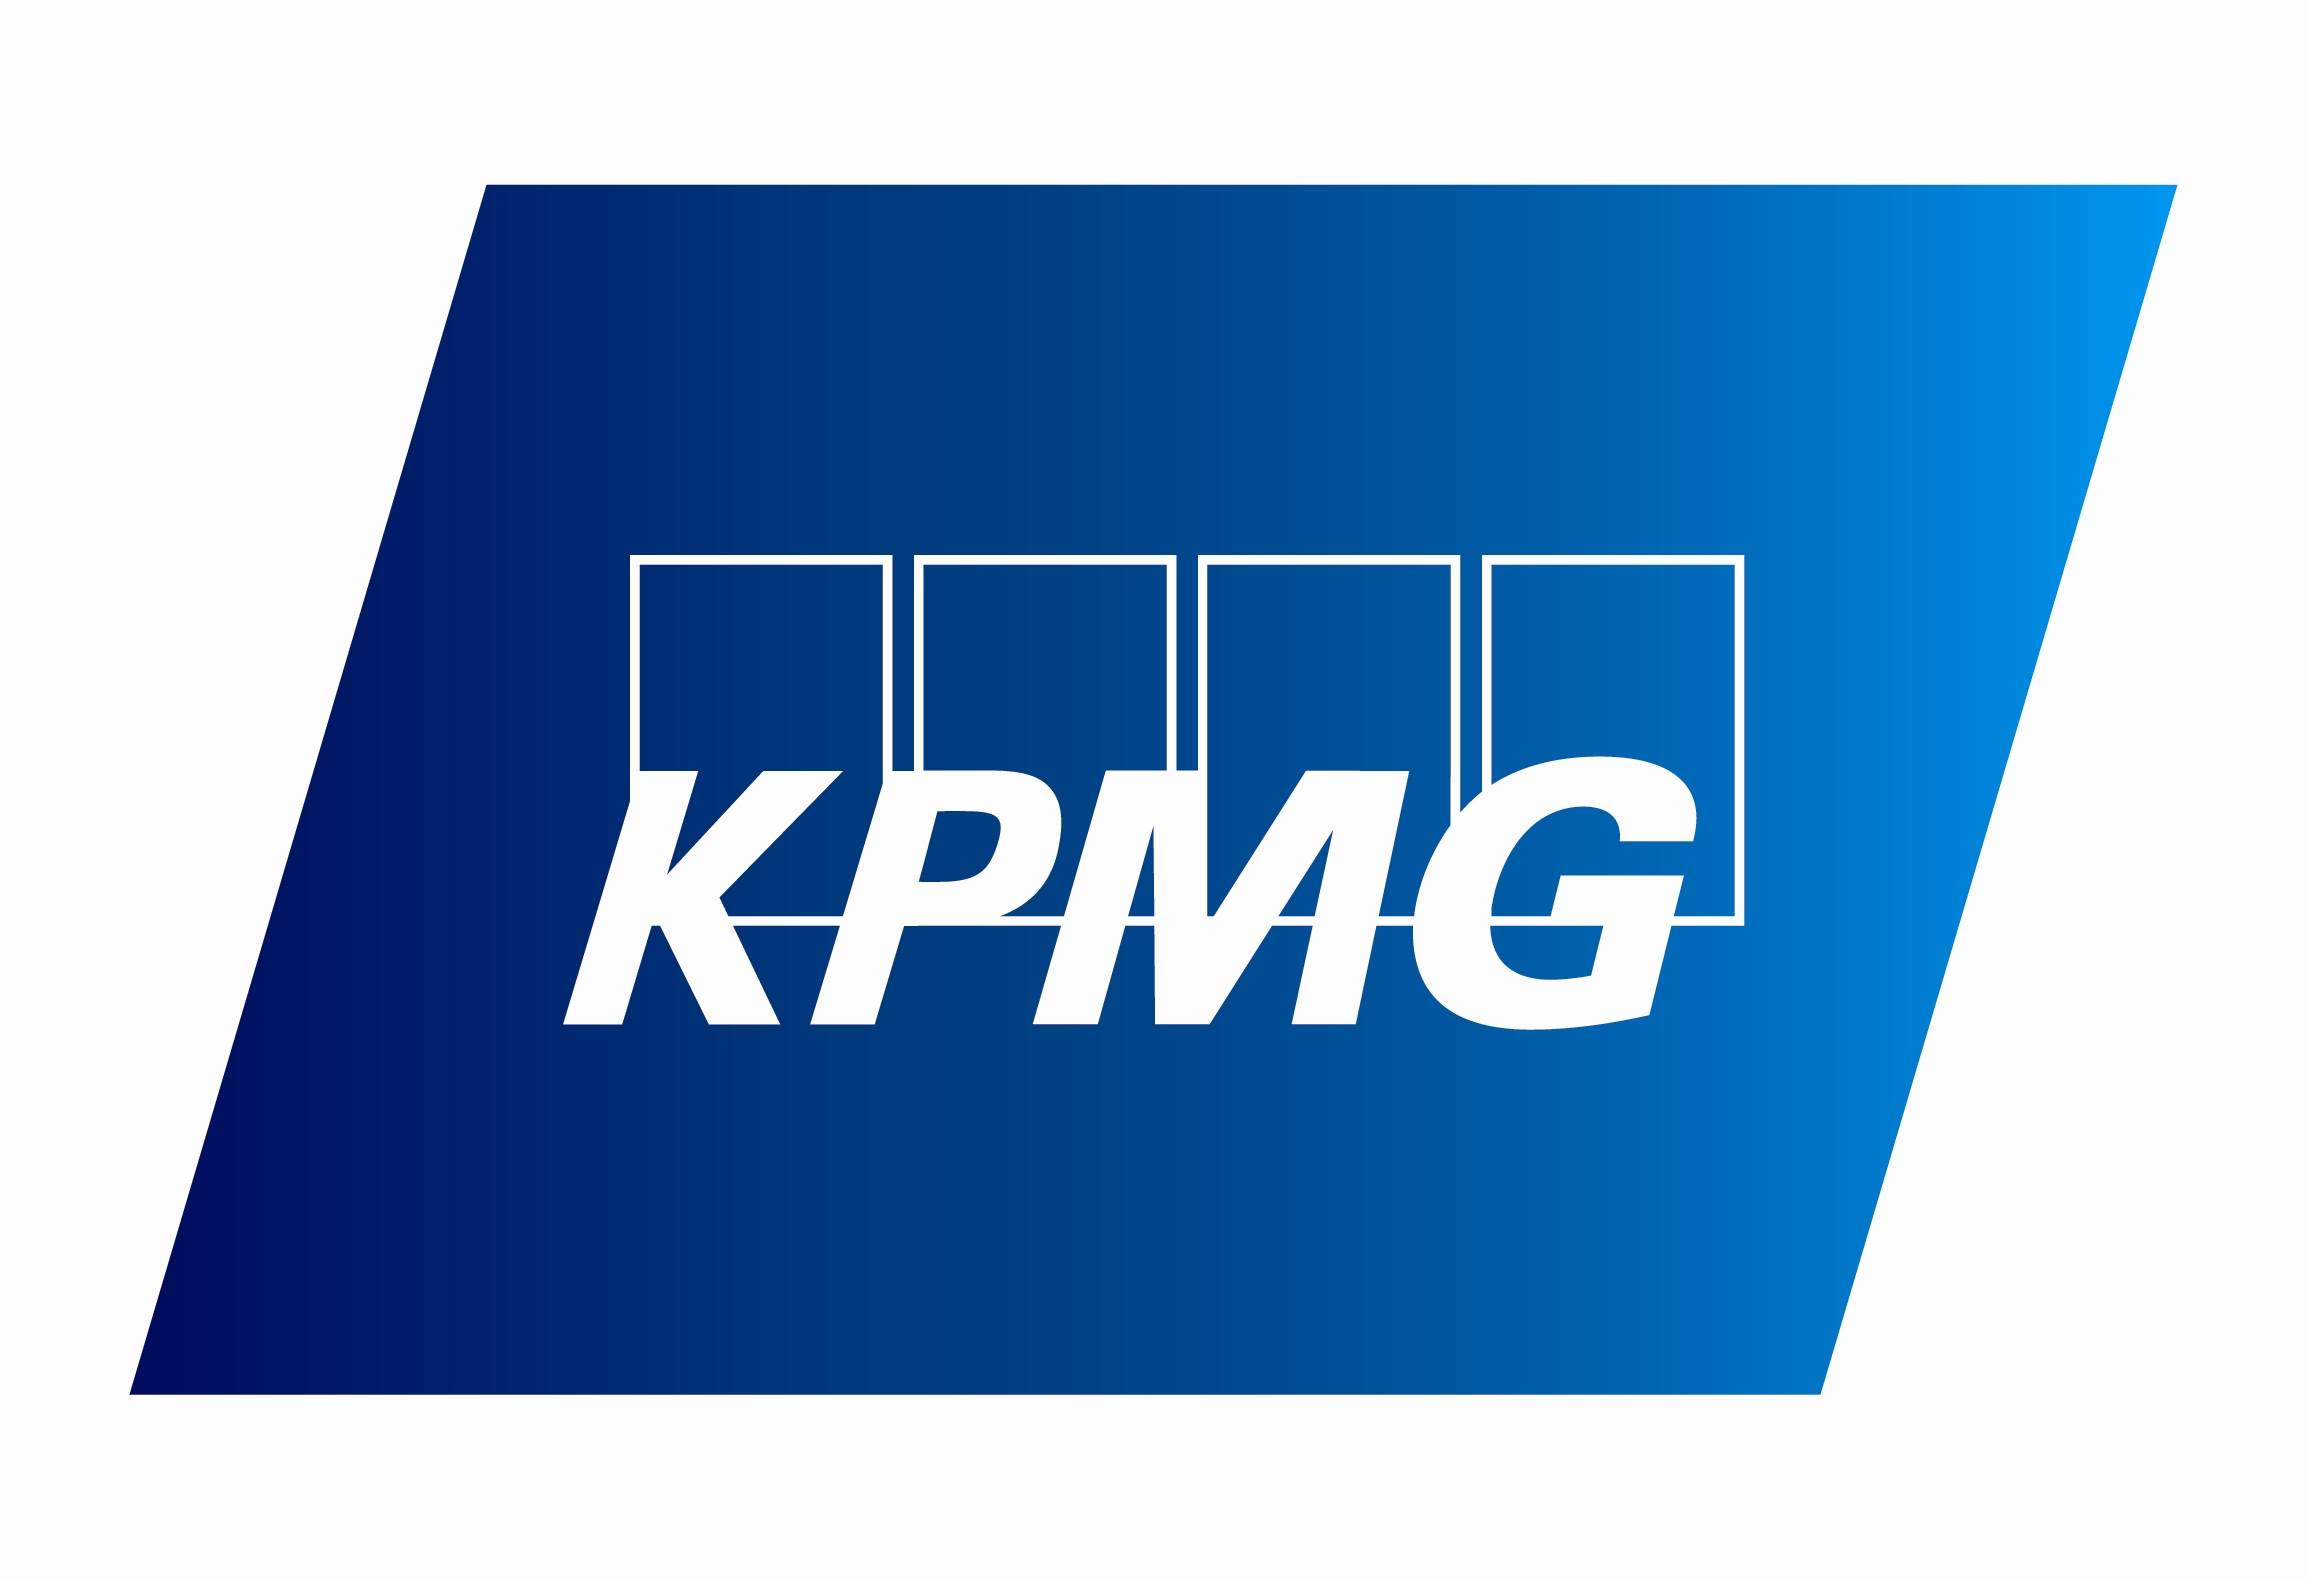 Graduate Trainees Opportunities at KPMG Nigeria